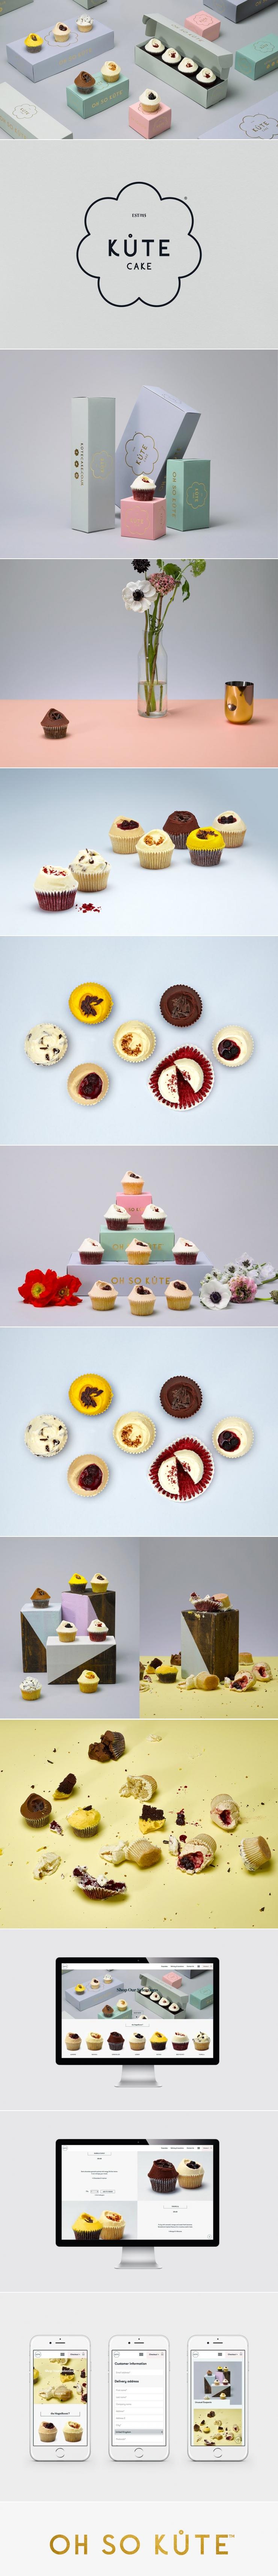 Kute Cake Artisan Cupcakes — The Dieline   Packaging & Branding Design & Innovation News